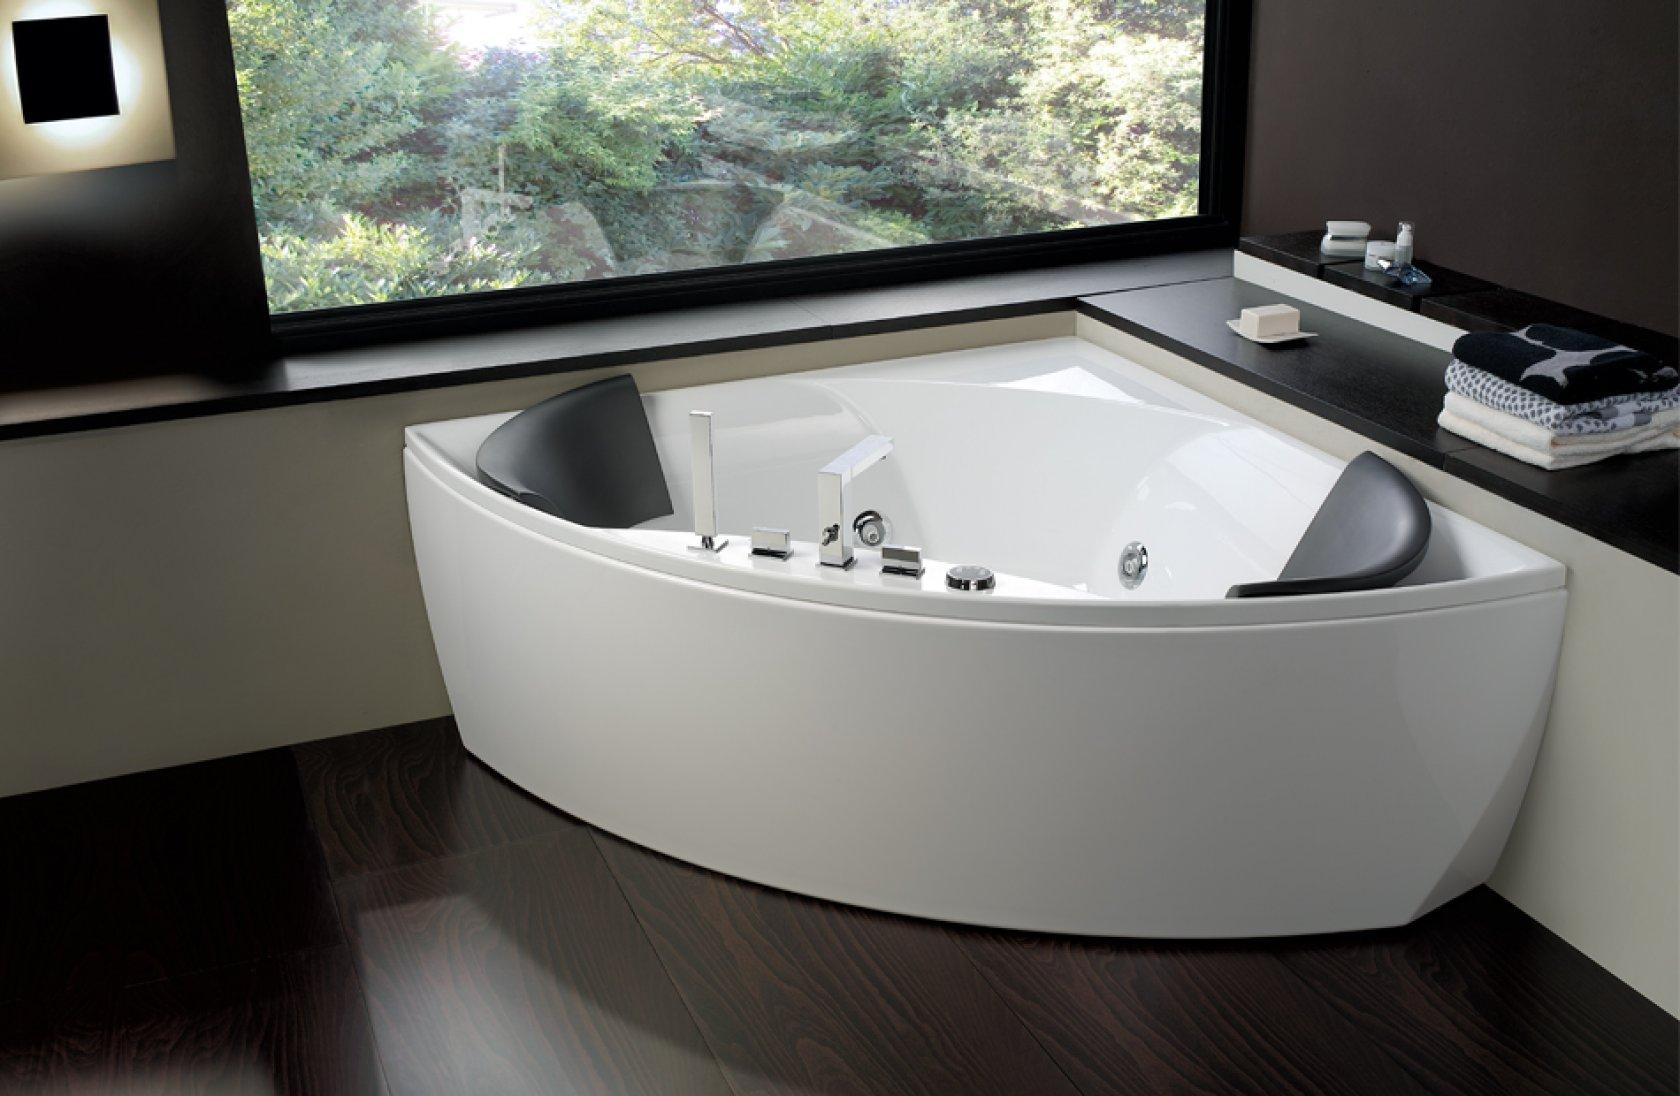 Vasche Da Bagno A Sedere Dimensioni : Vasche da bagno piccole con seduta u bagnomoderna